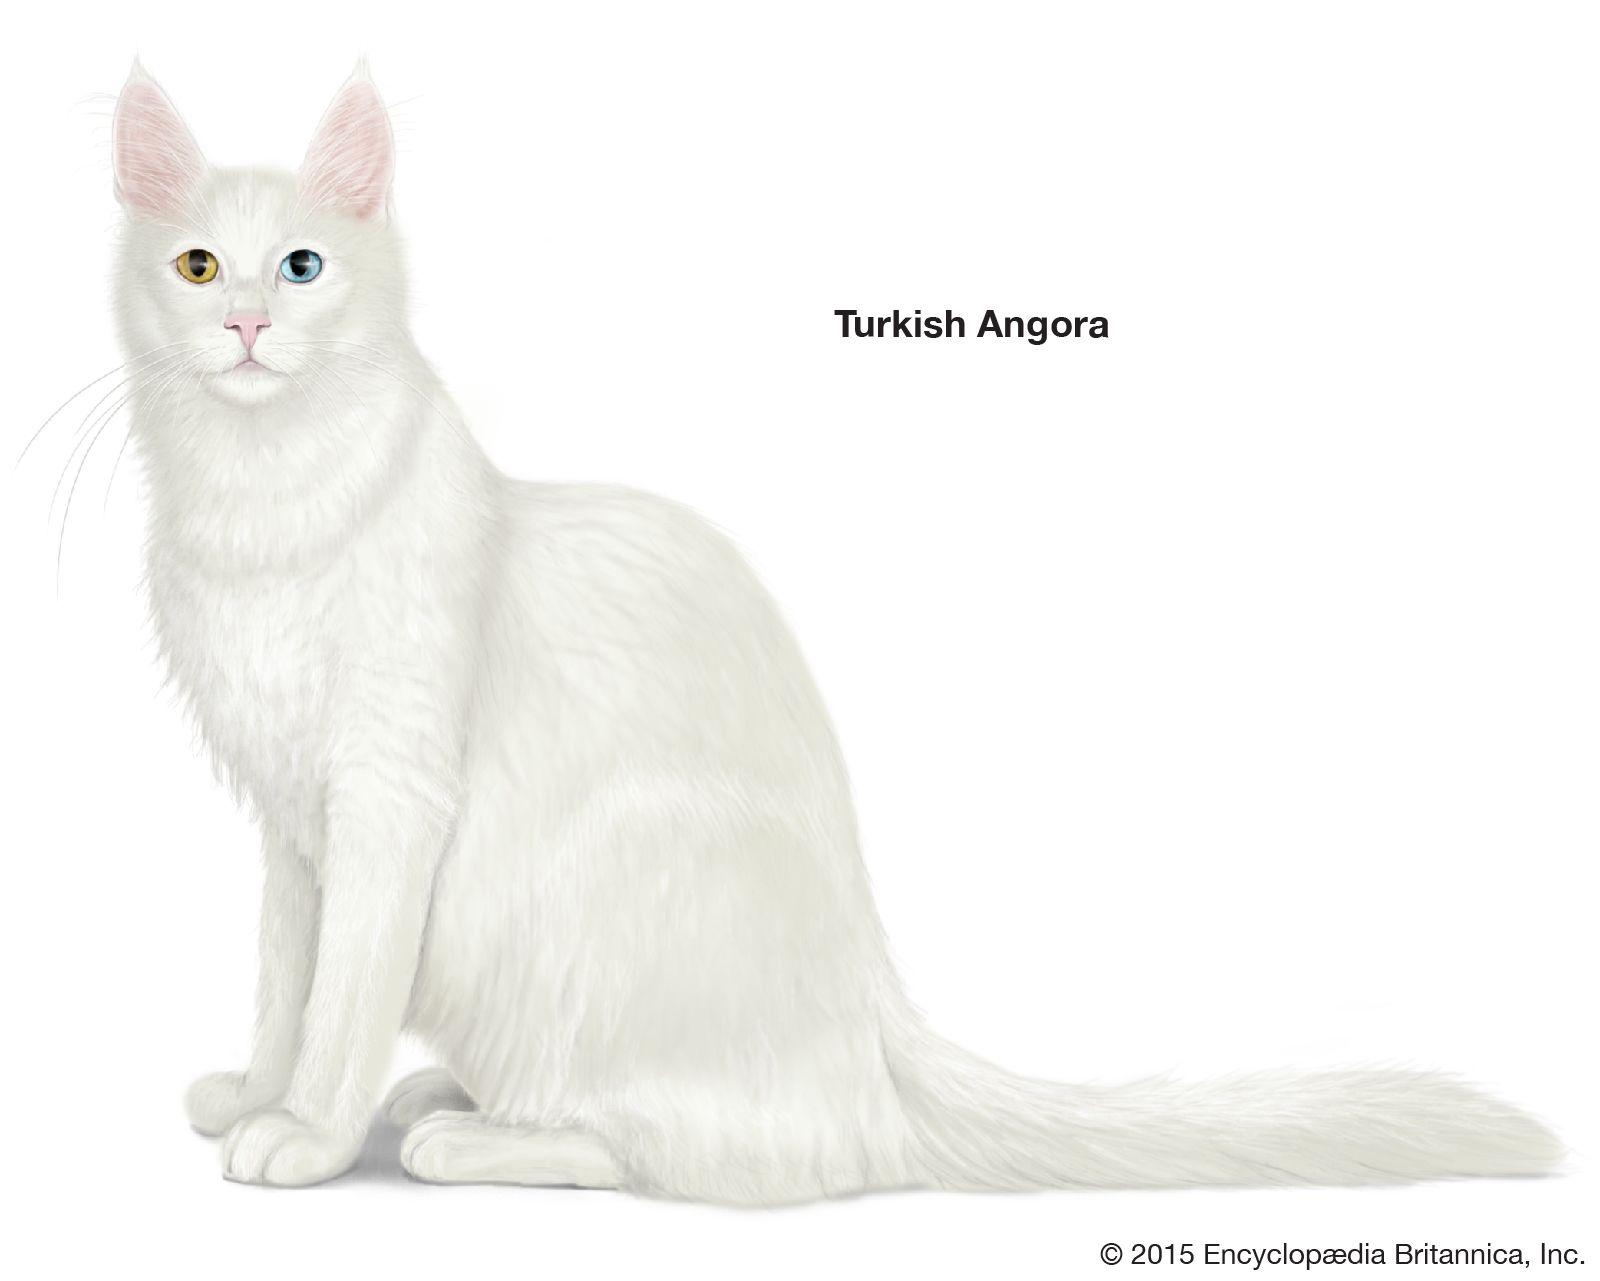 cat   E AZVM - Carnivora - Feliformia - Felidae - 'Lesser